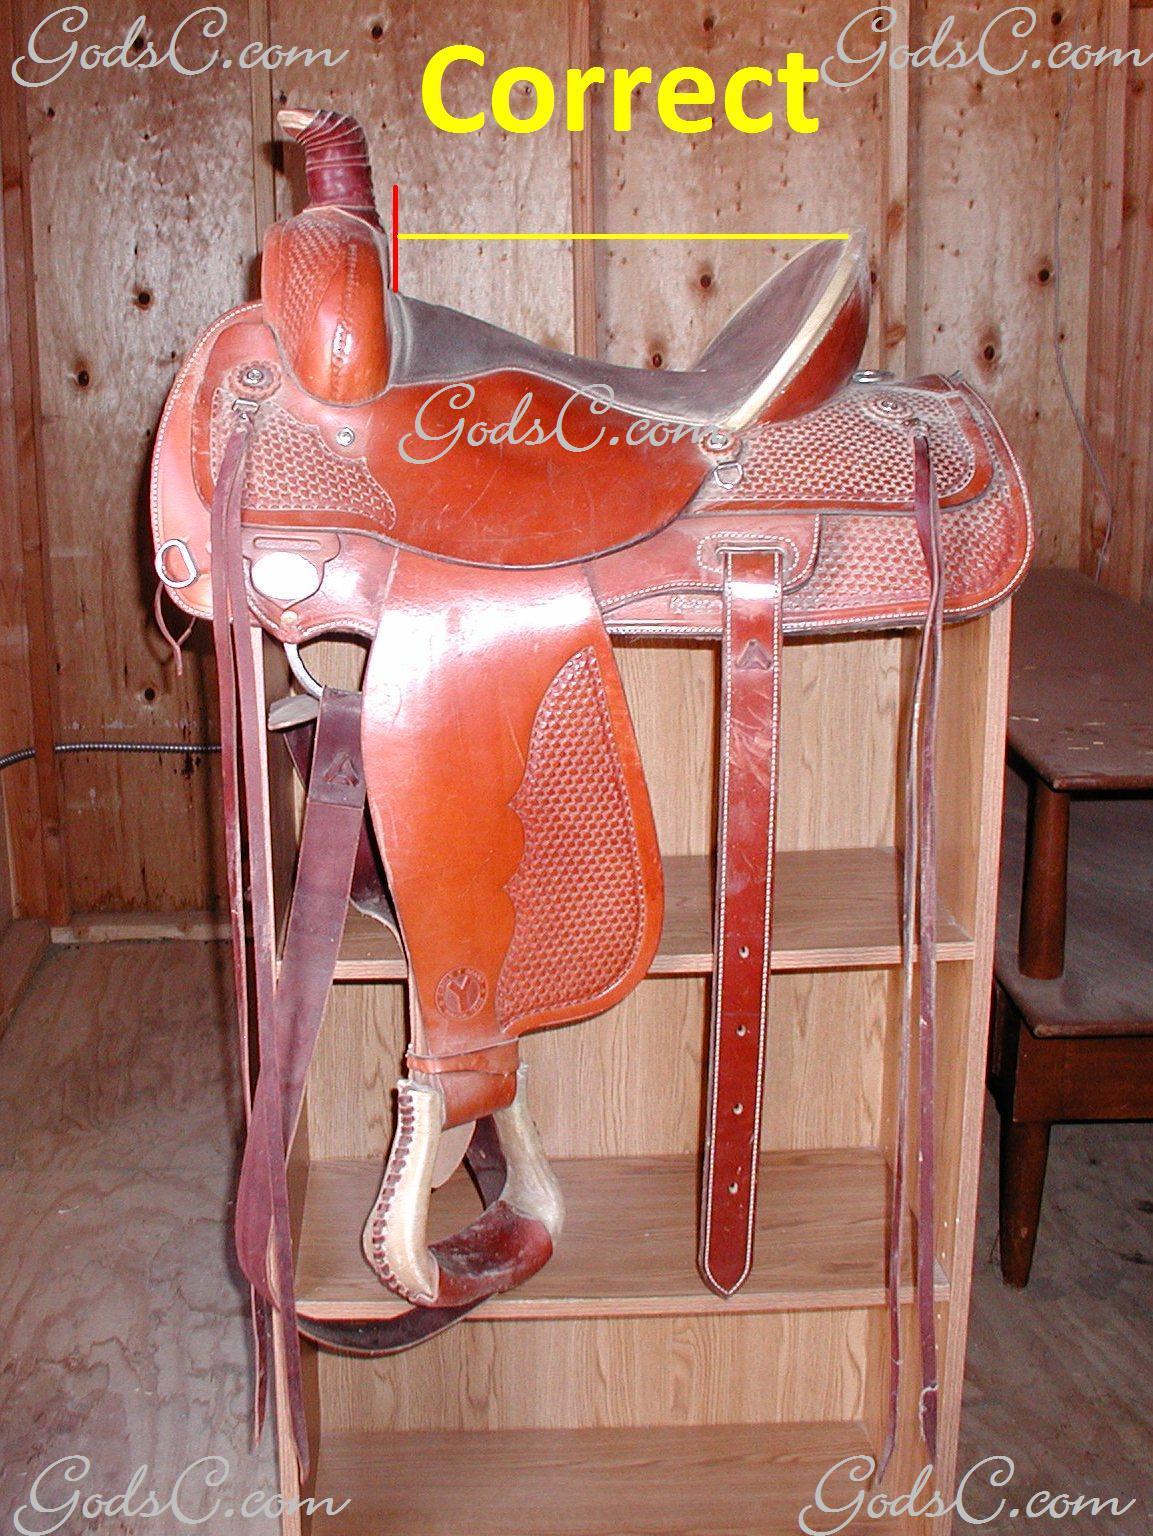 Western Saddle Chair - The saddle